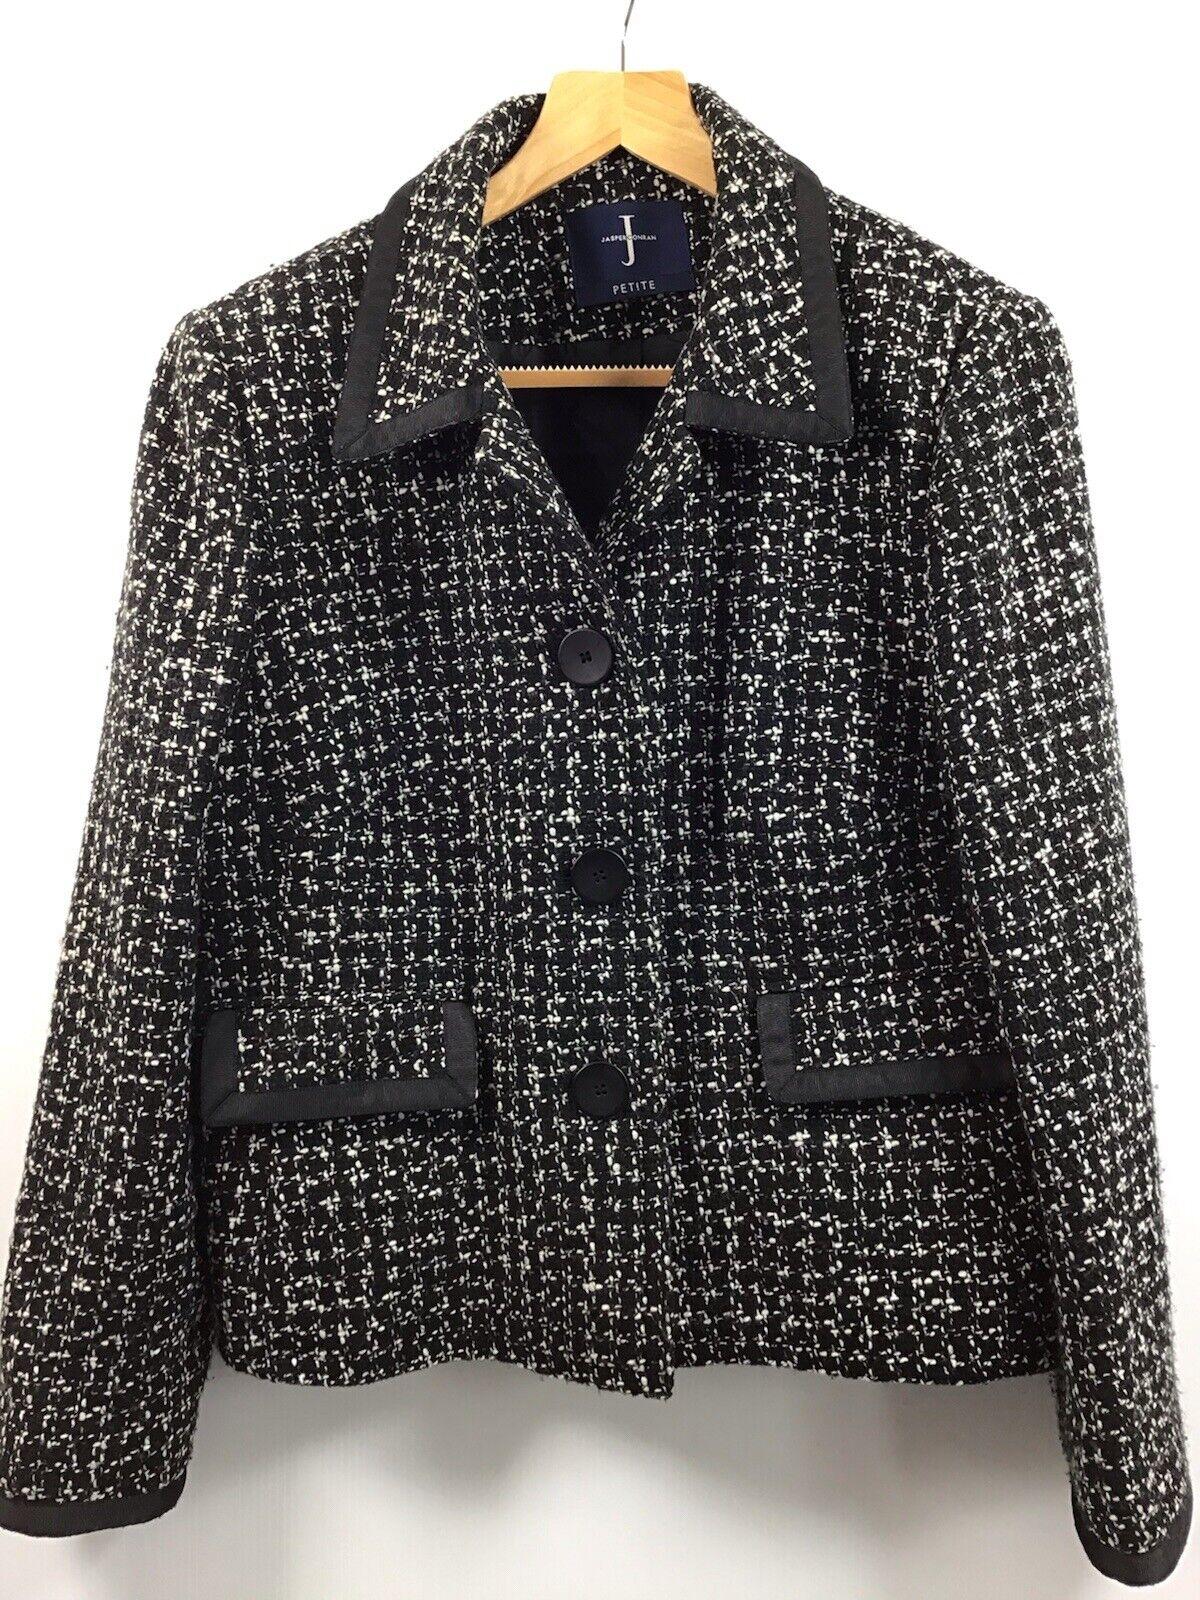 Jasper Conran Black & White Tweed Women's Short Jacket Wool Blend Size 16 Petite